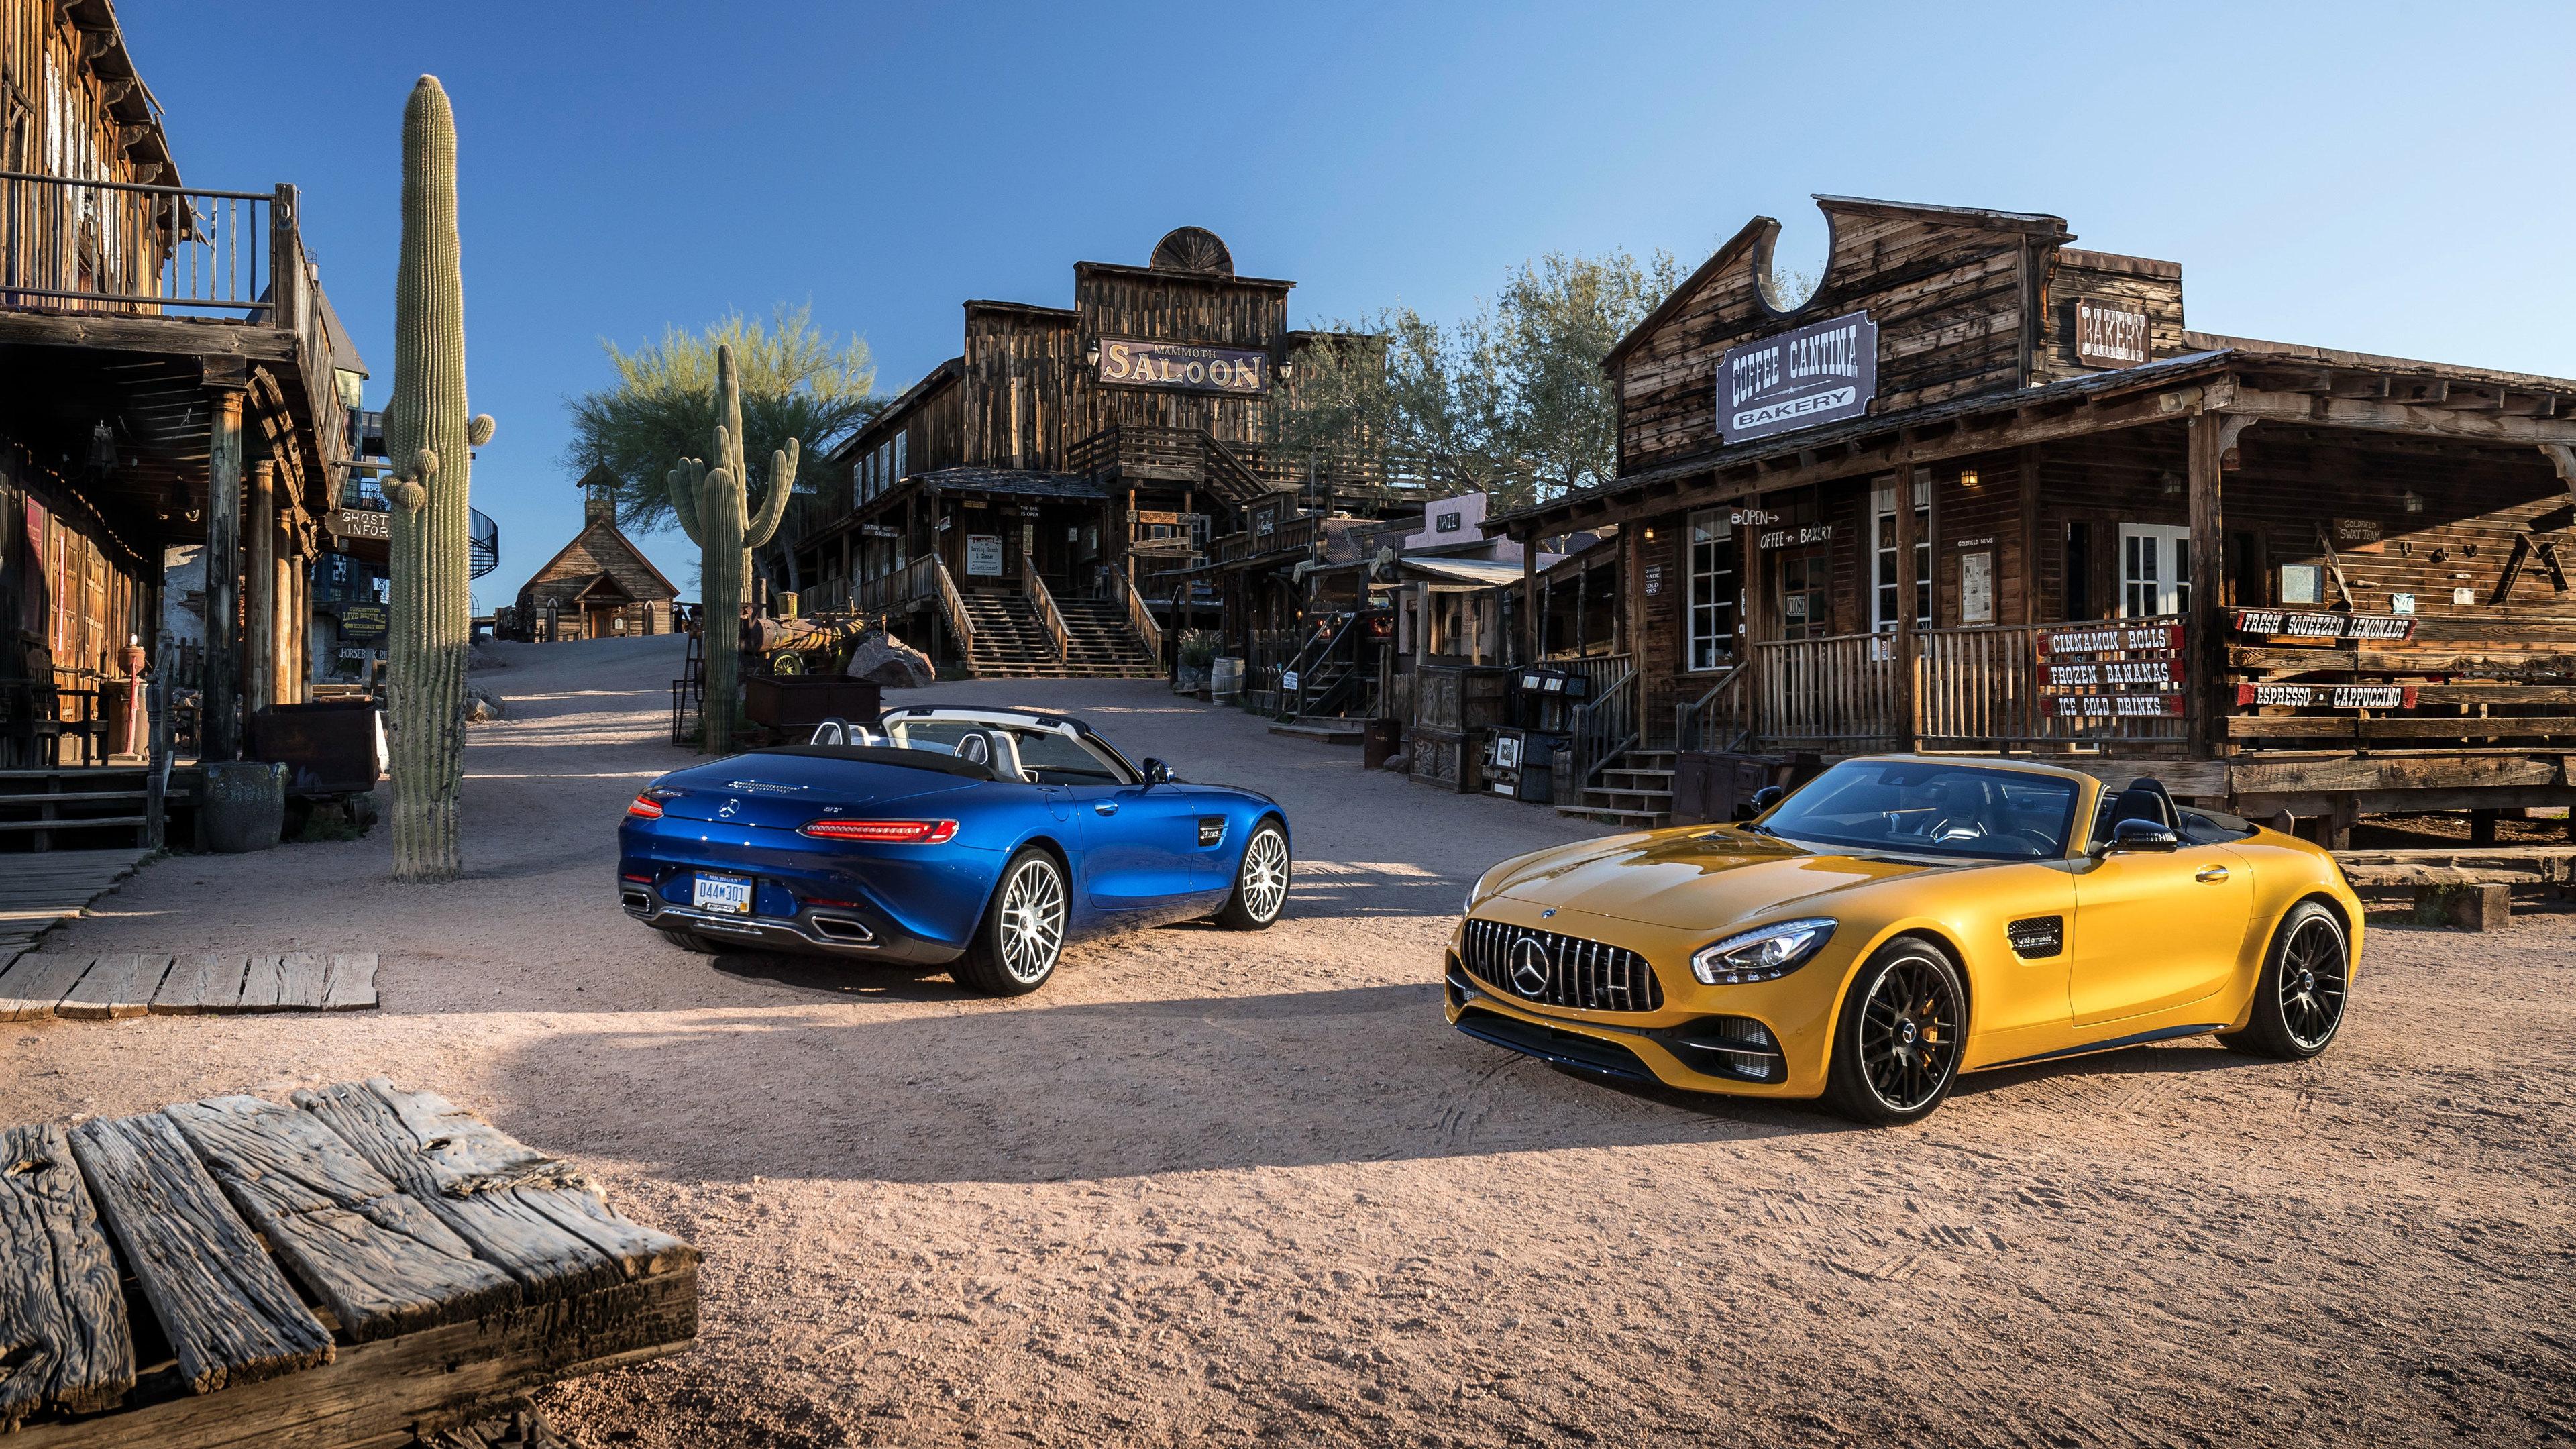 mercedes amg gt 4k 2017 1539105358 - Mercedes AMG GT 4k 2017 - mercedes wallpapers, mercedes amg wallpapers, hd-wallpapers, cars wallpapers, 4k-wallpapers, 2017 cars wallpapers